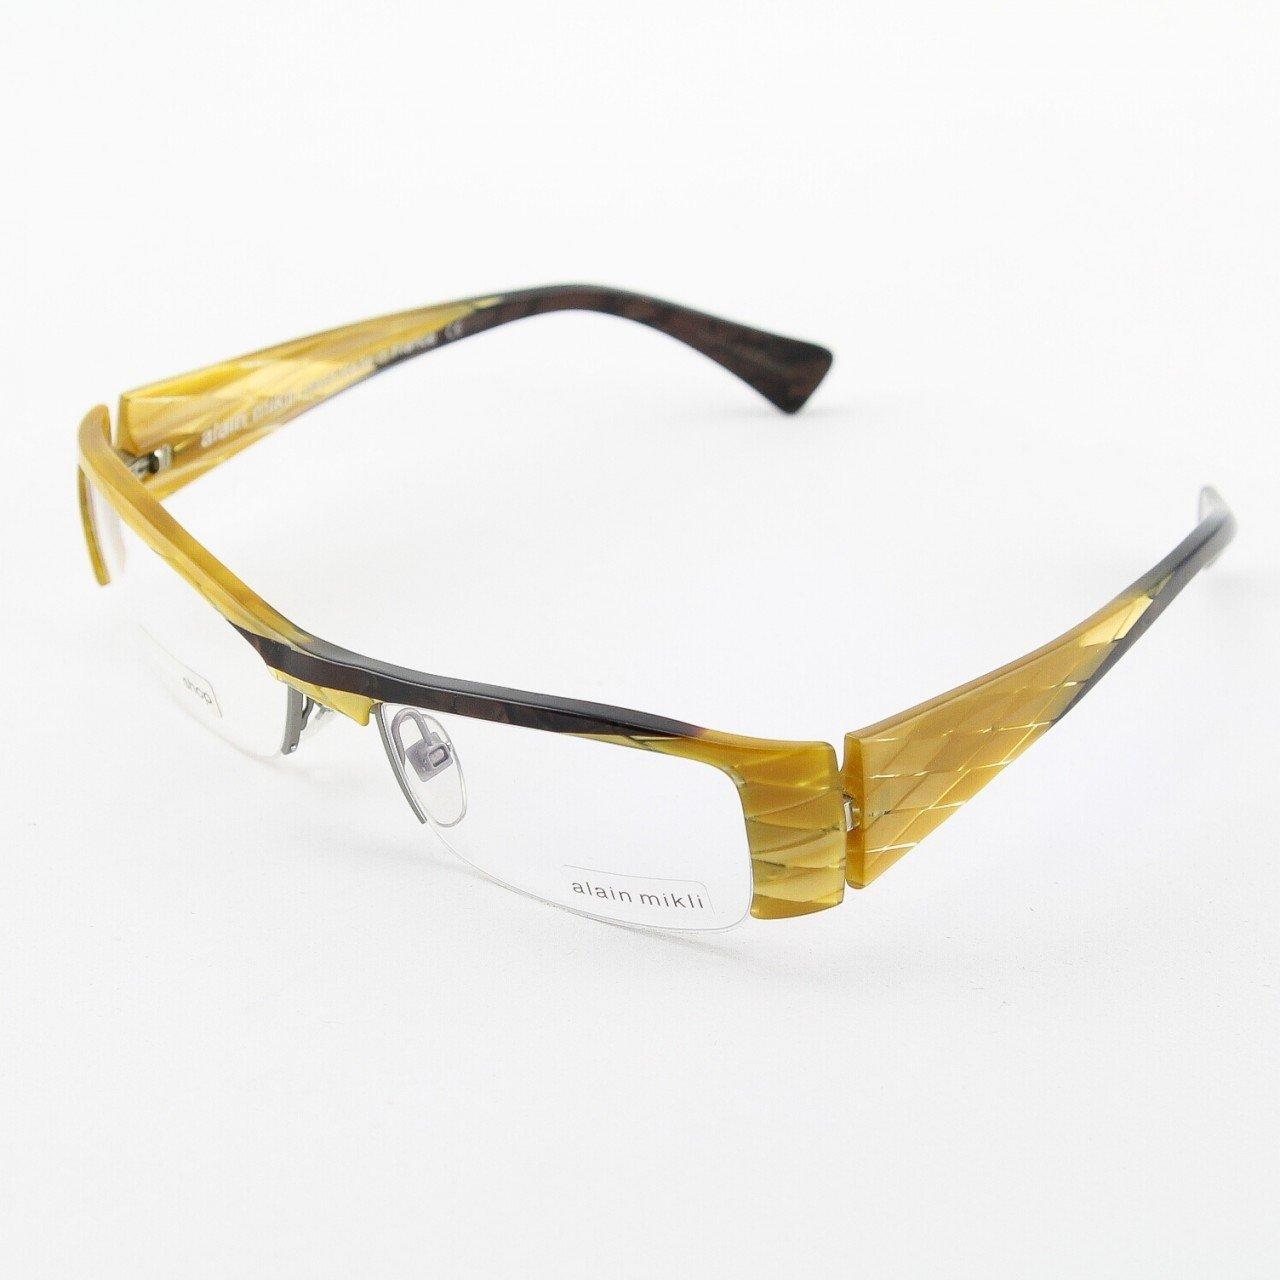 Alain Mikli Eyeglasses AL0757 Col. 21 Black and Gold Geometric